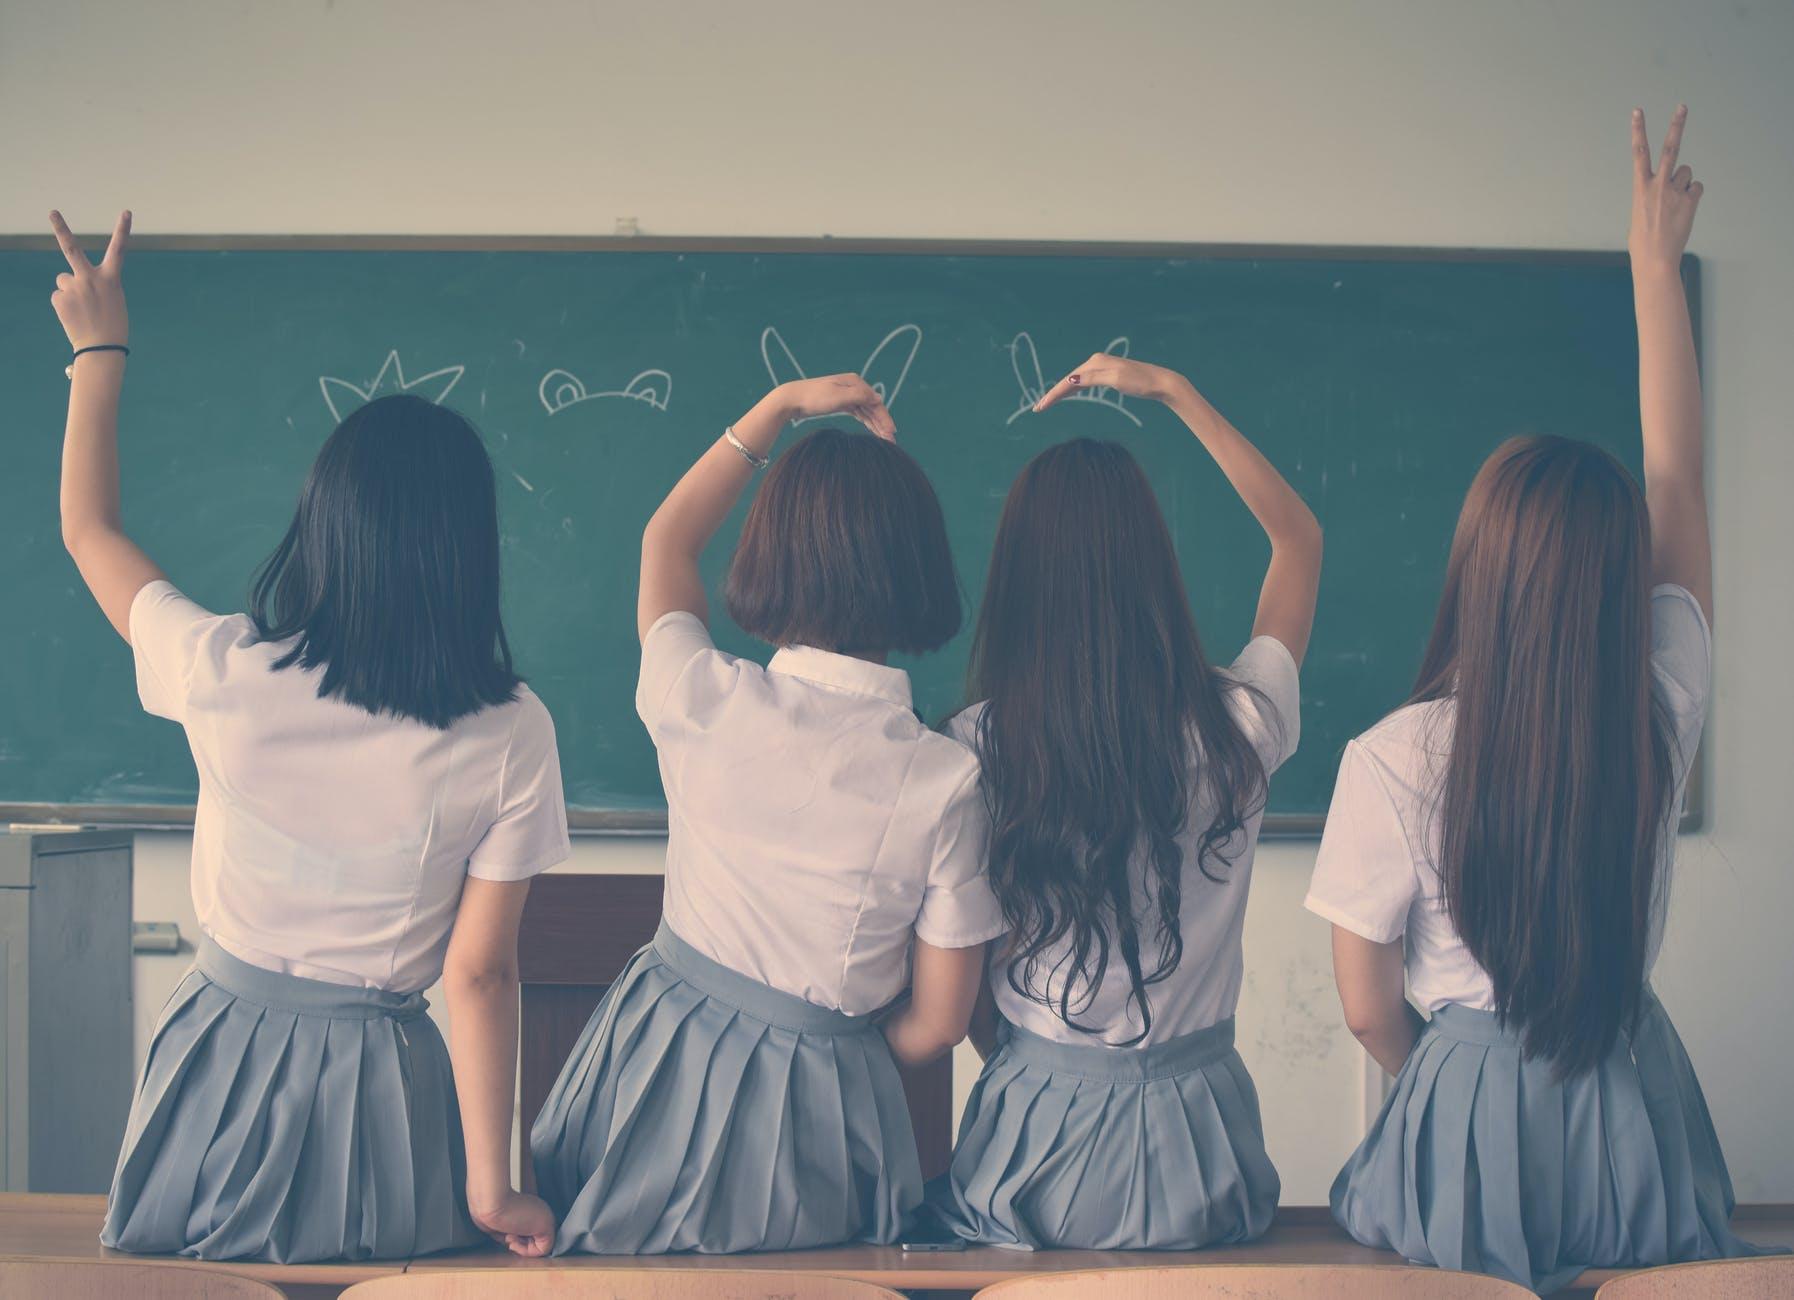 photo of four girls wearing school uniform doing hand signs